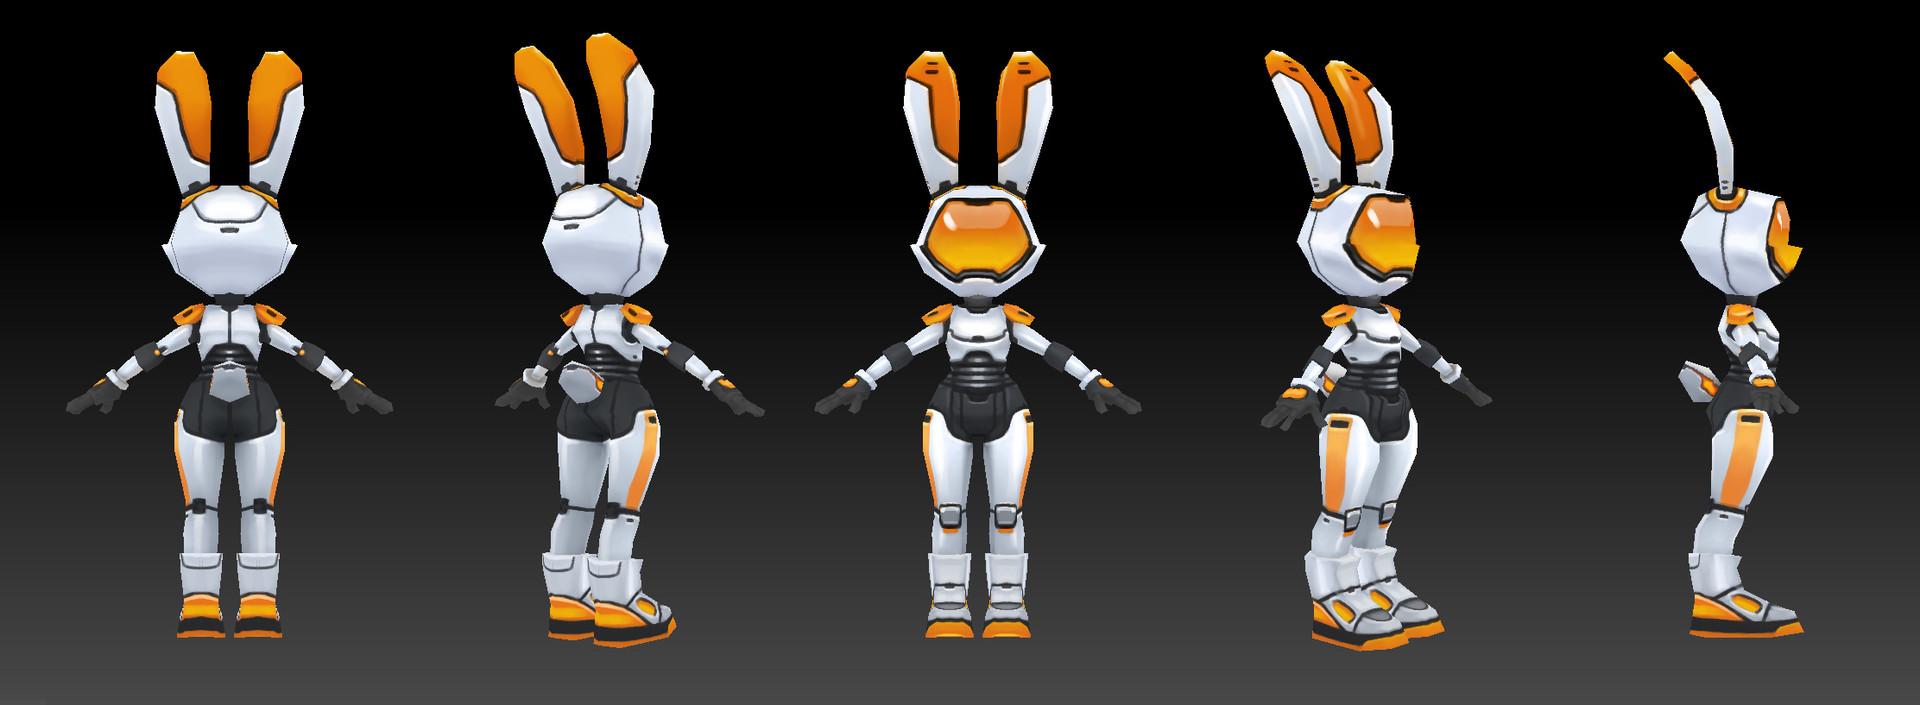 Jose cua cyber bunny final